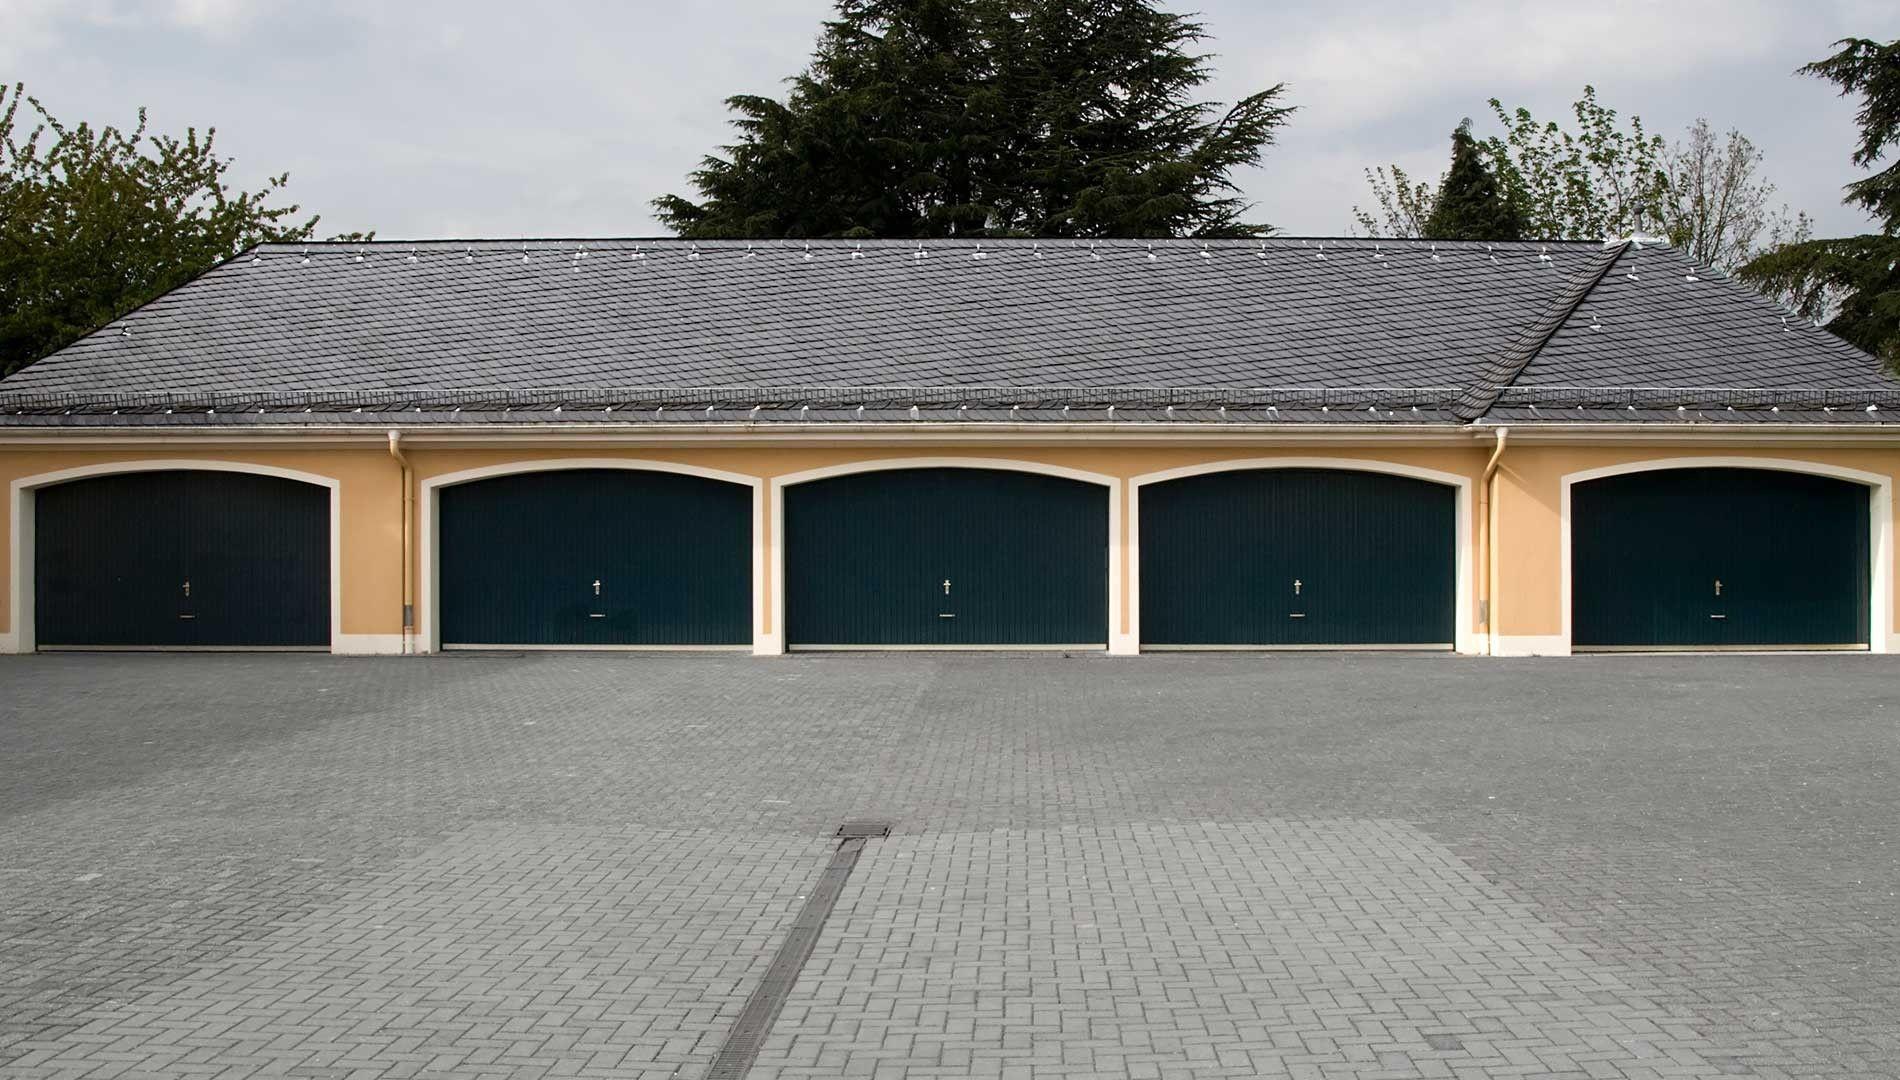 2 Car Garages For Sale: Homes With Car Garages For Sale Denver Colorado Prefab Two